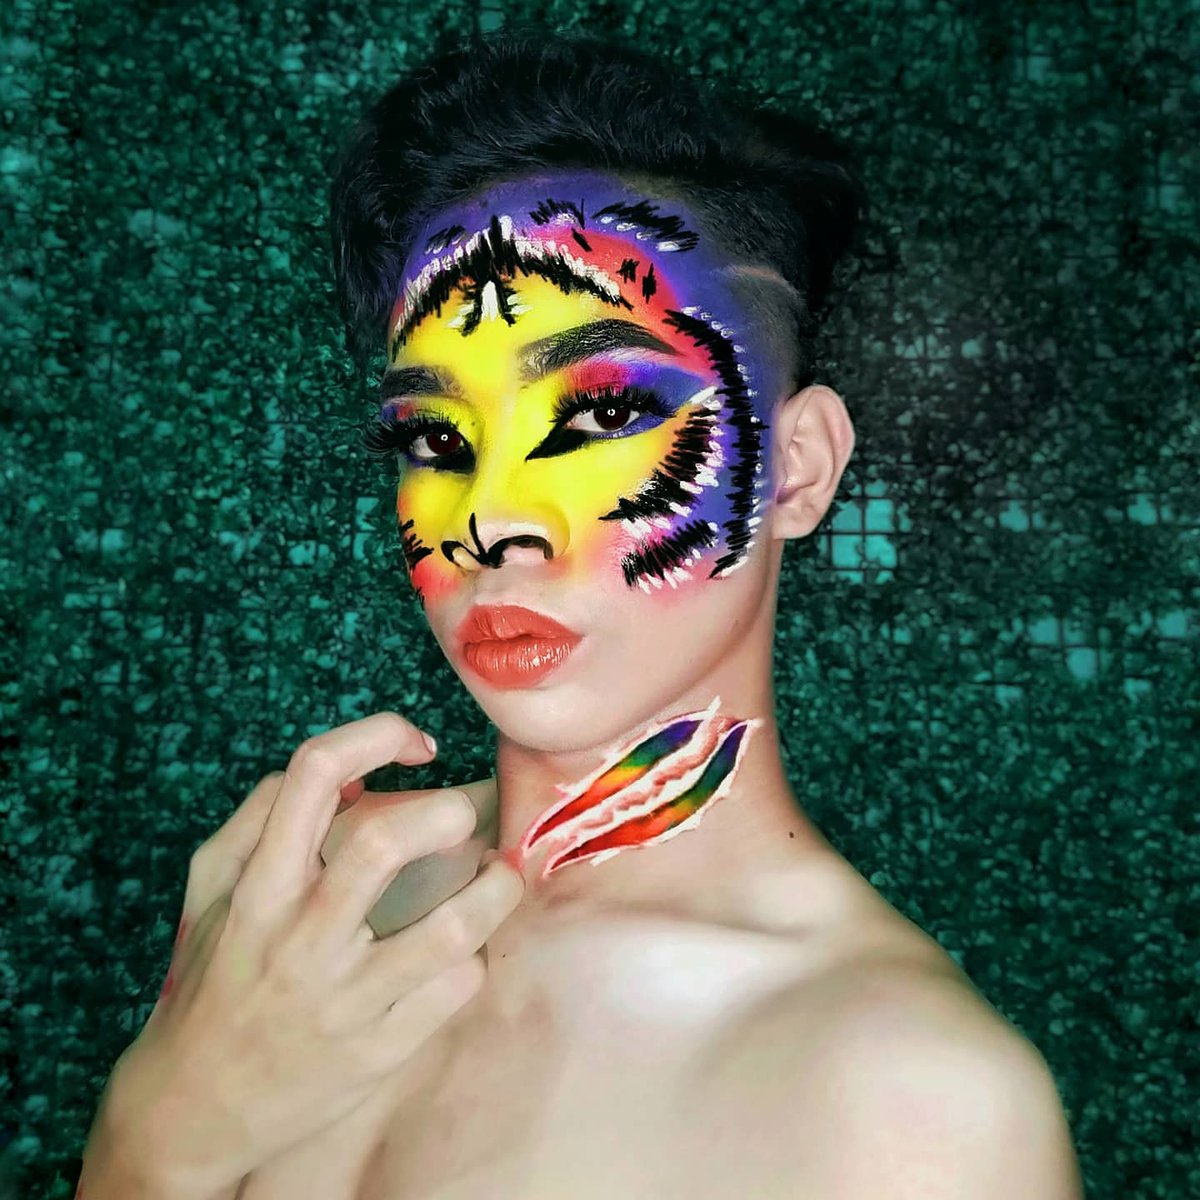 𝘾𝙊𝙇𝙊𝙍𝙁𝙐𝙇 𝙍𝙊𝘼𝙍 ! #brows #beauty  #abh #makeupartist #makeupoftheday #carelinegang #careline #mua #makeup #morphebabe #makeuplooks #anastasiabeverlyhills #undiscovered_muas #unleashyourinnerartist  #colourpop #100daysofmakeup  #makeupartistworldwide #norvinapic.twitter.com/eWycyhMuGT